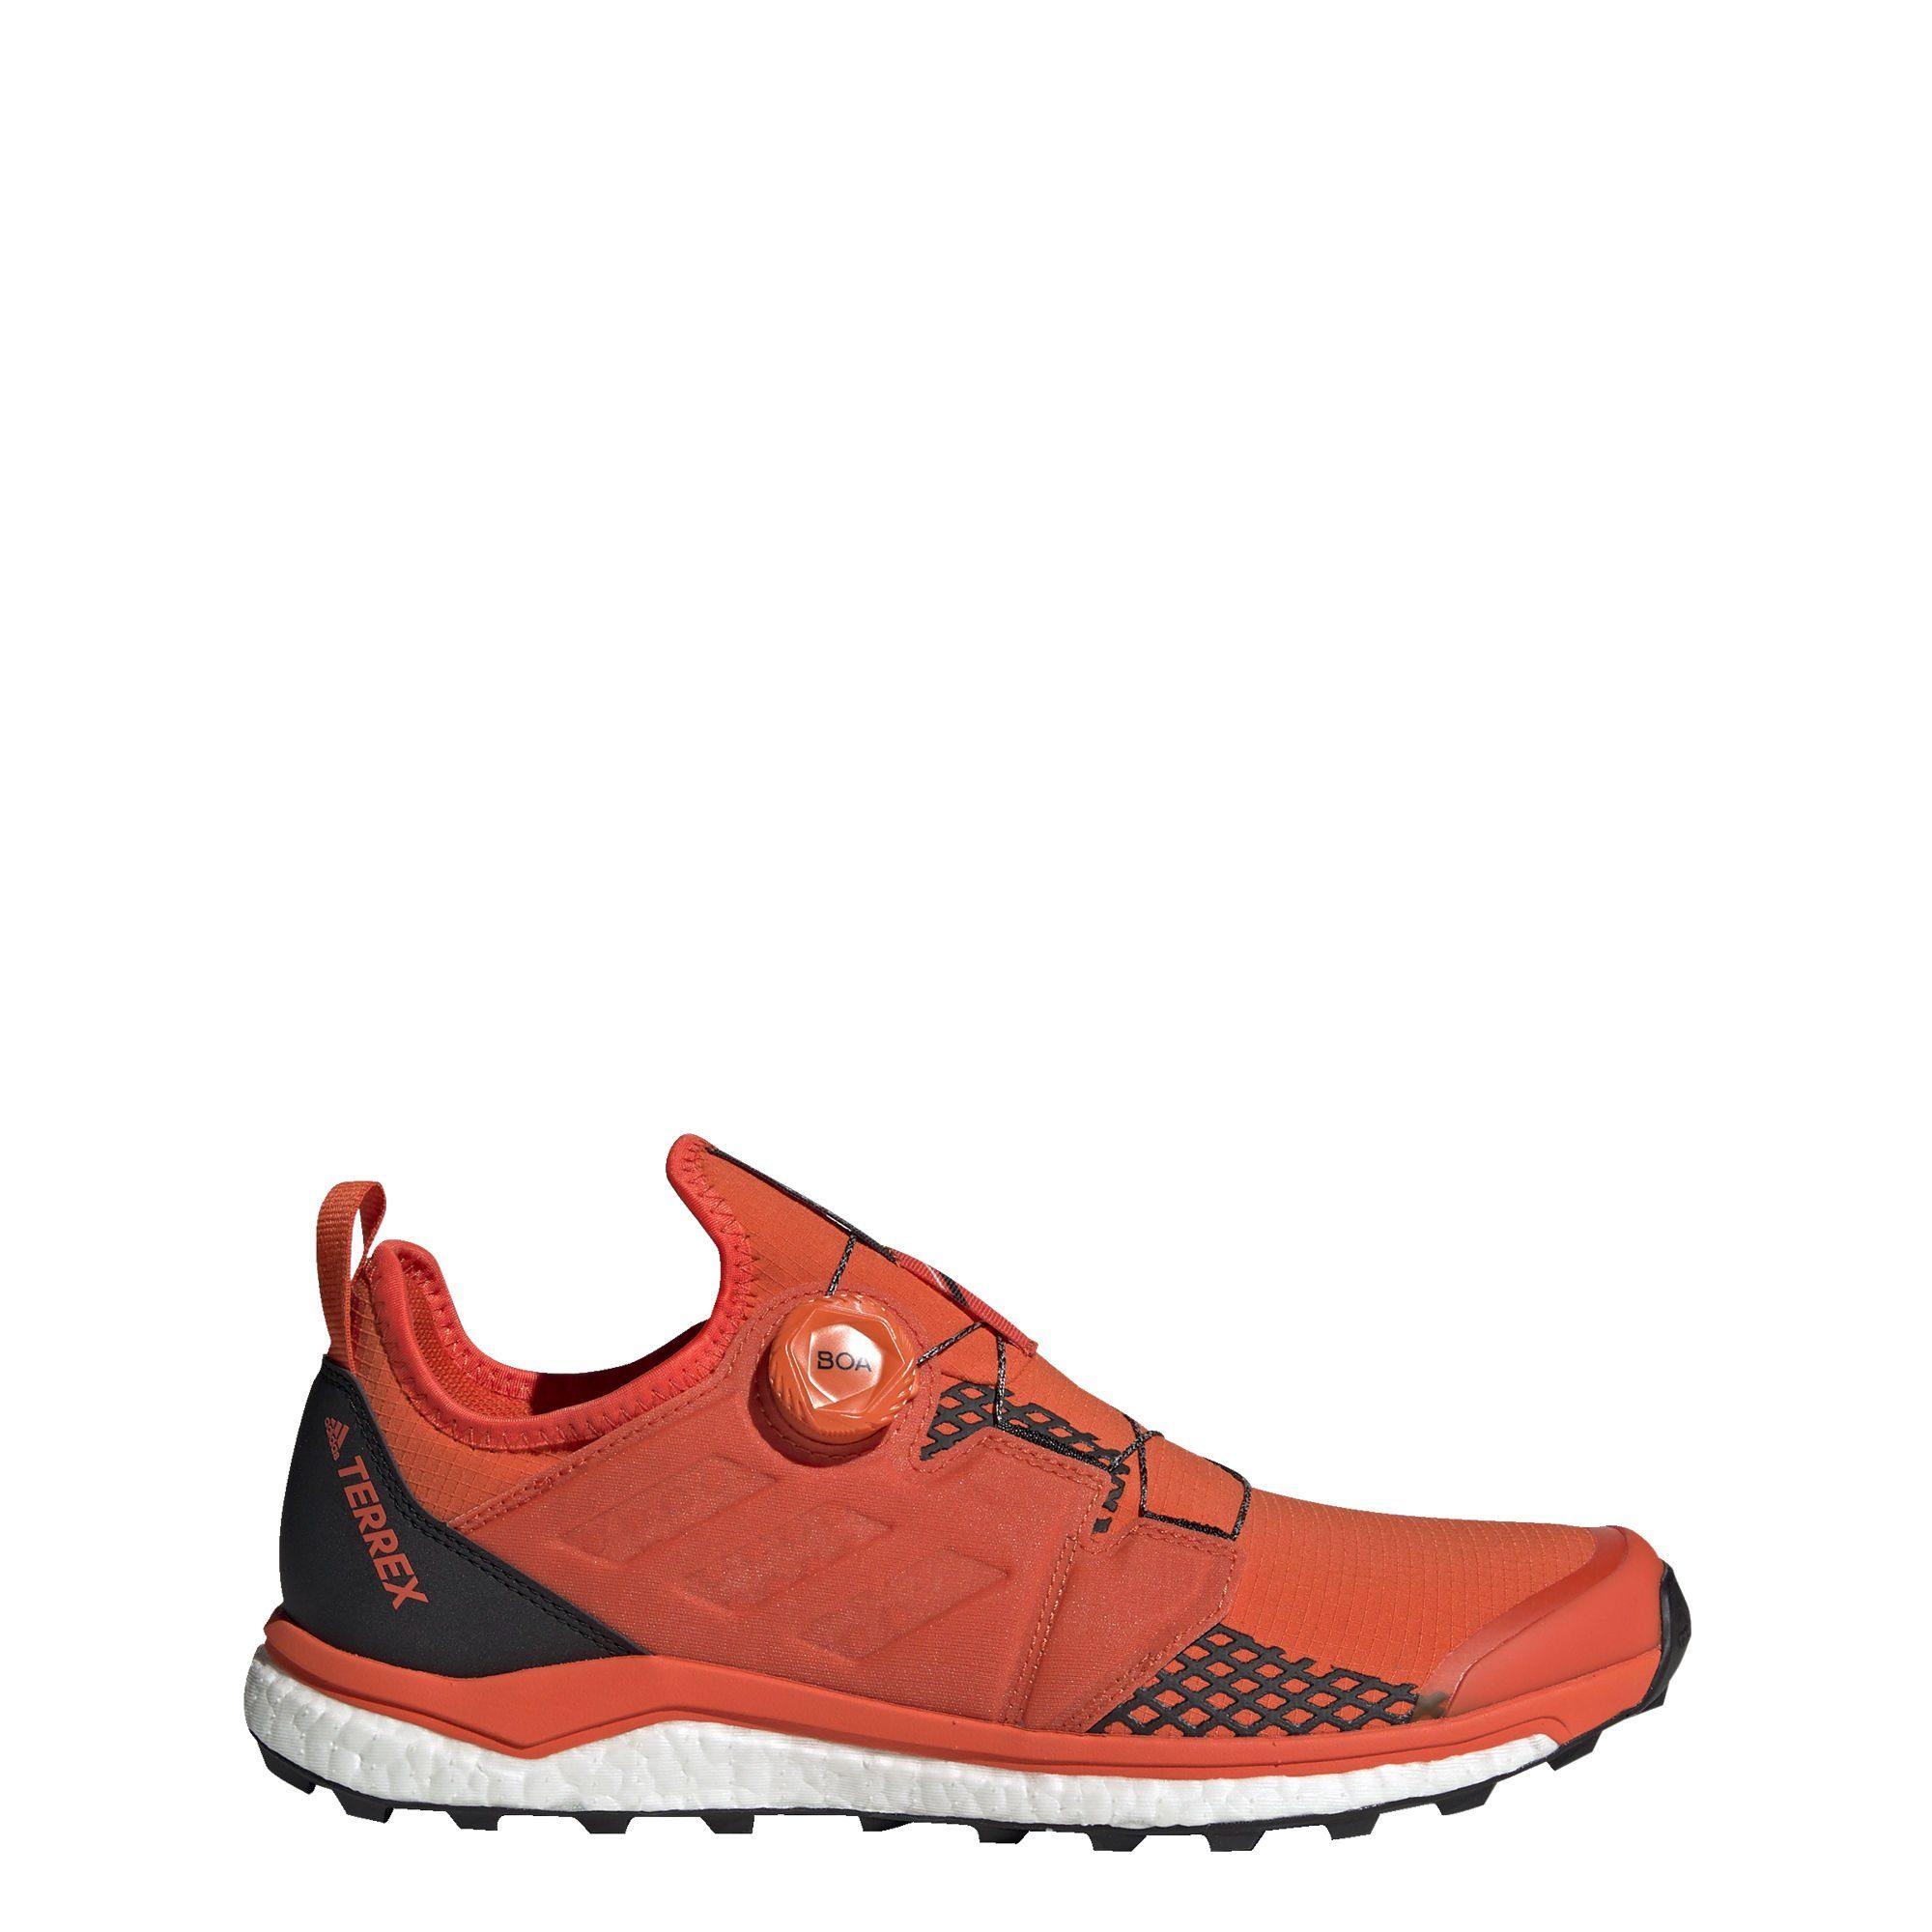 ADIDAS Herren TERREX Agravic Boa Schuh online kaufen bei